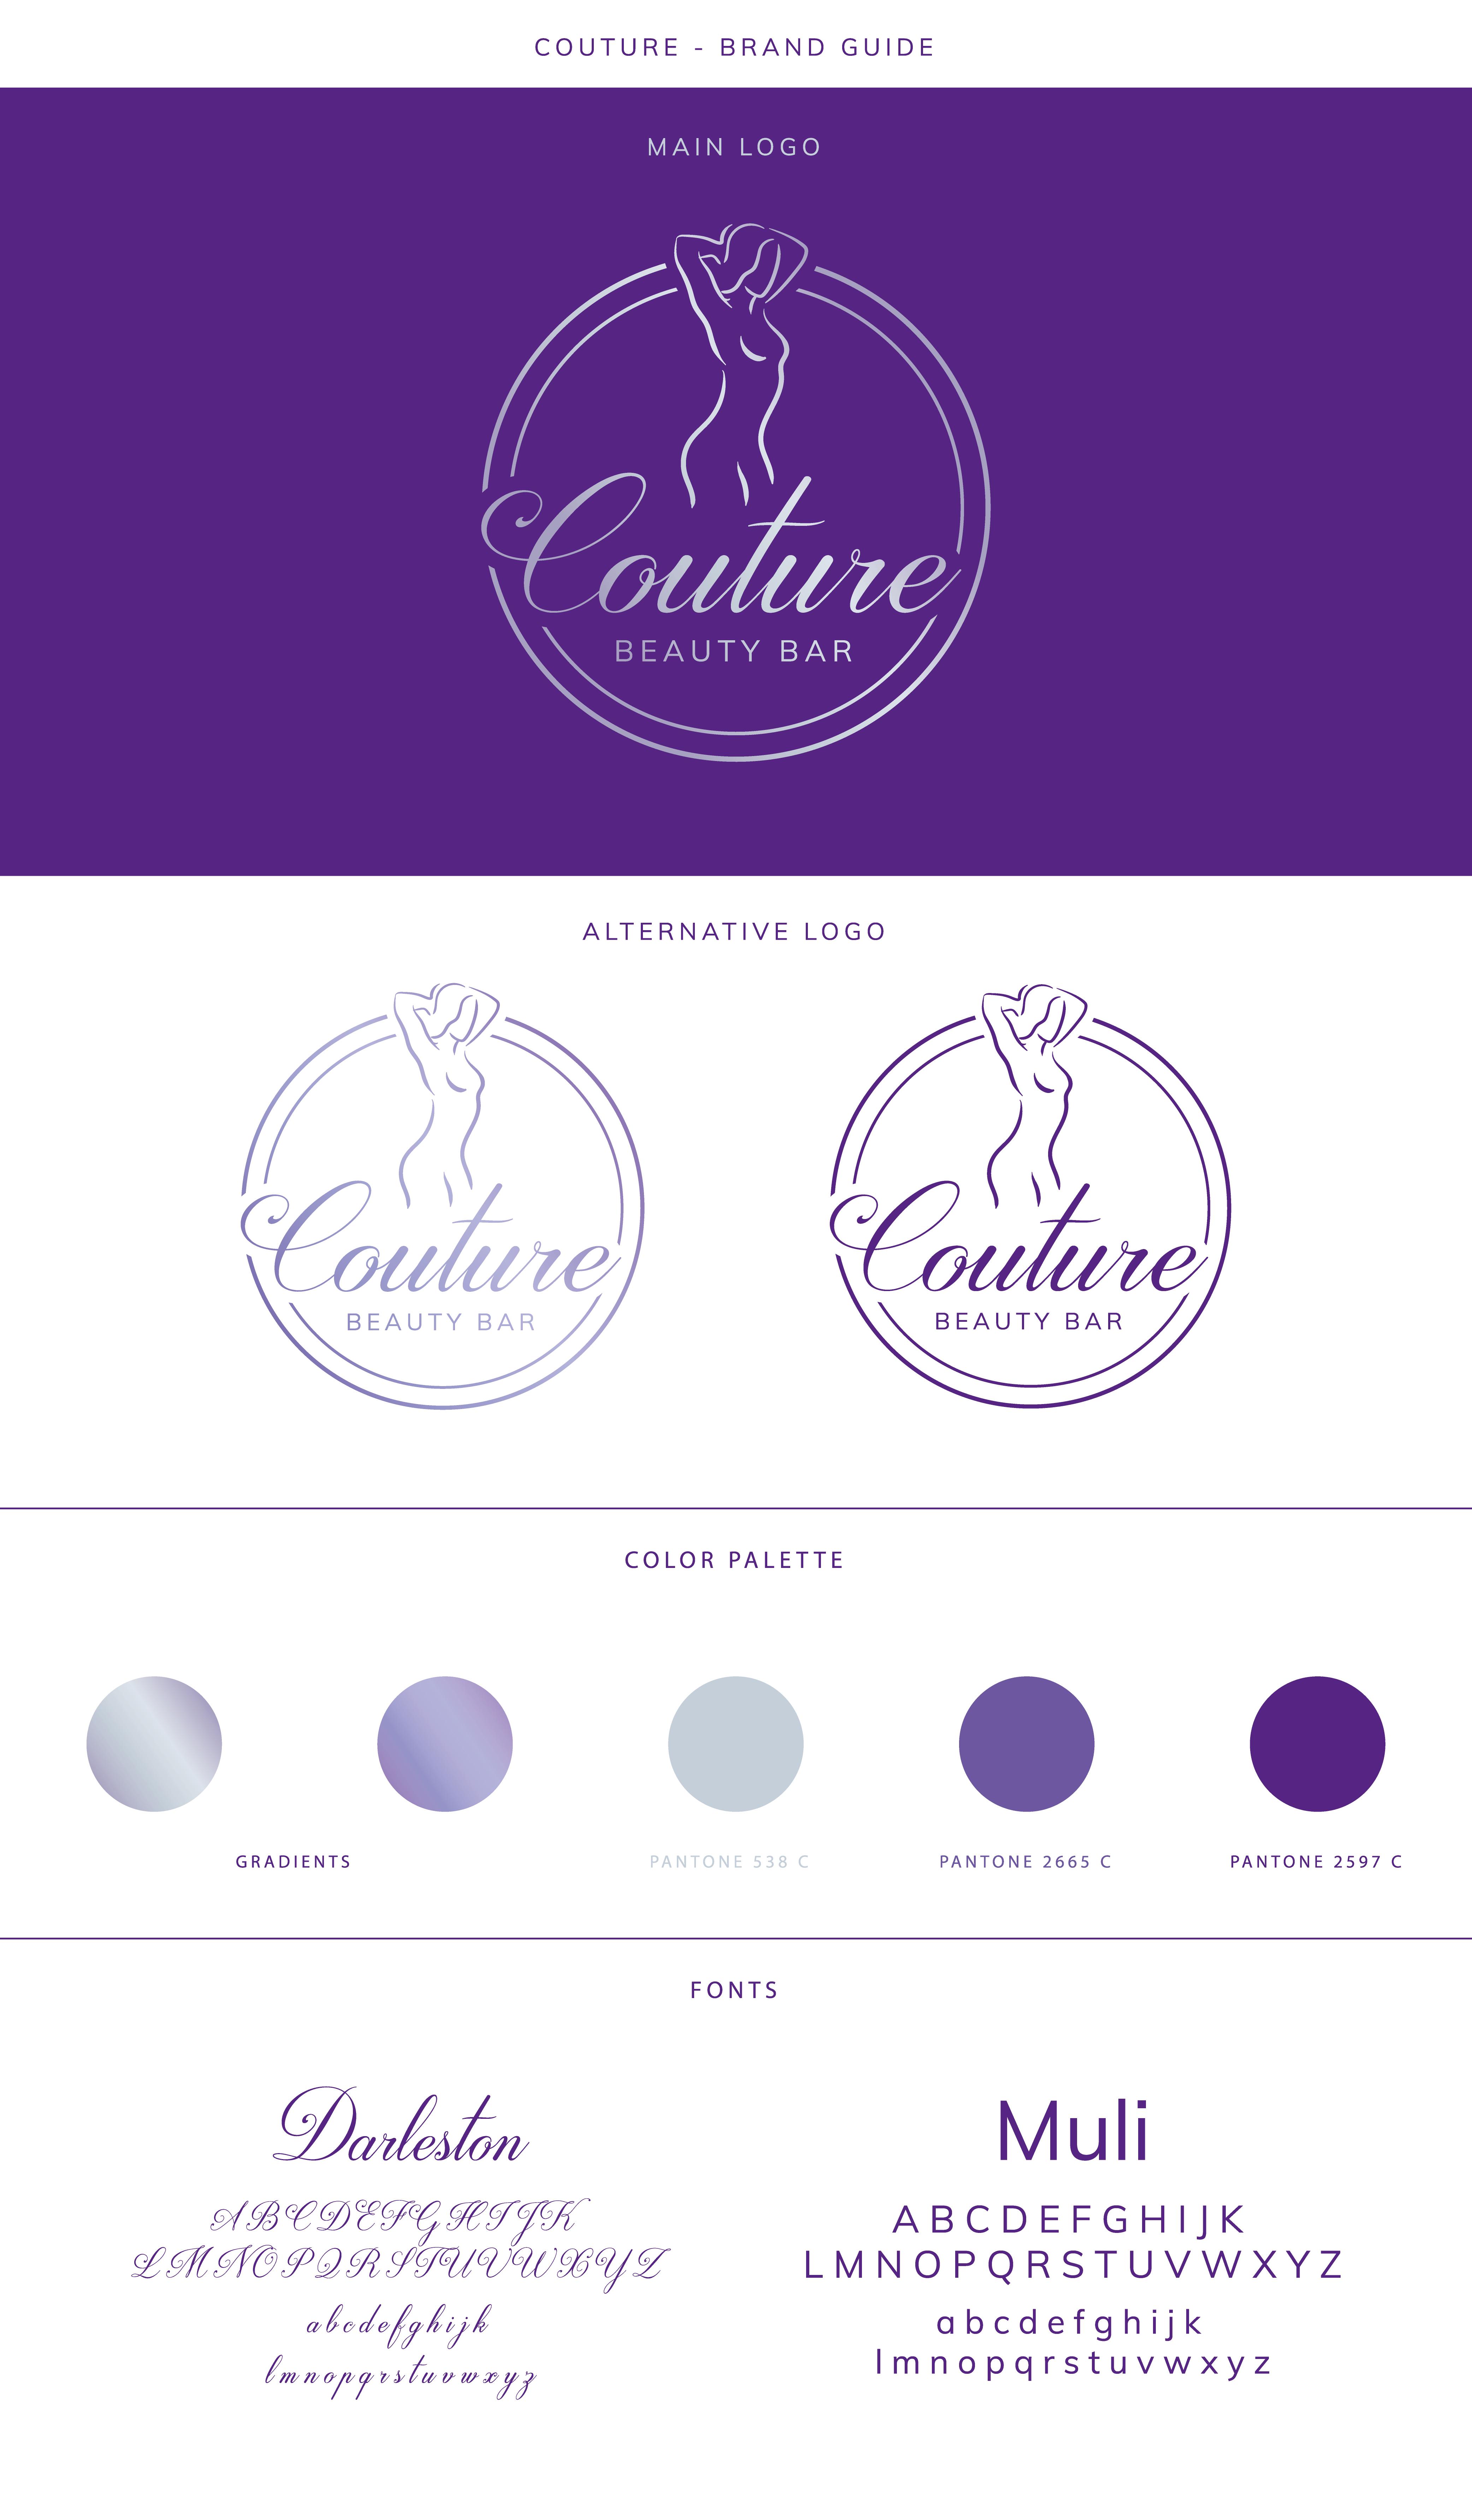 Couture Beauty Bar, Main logo